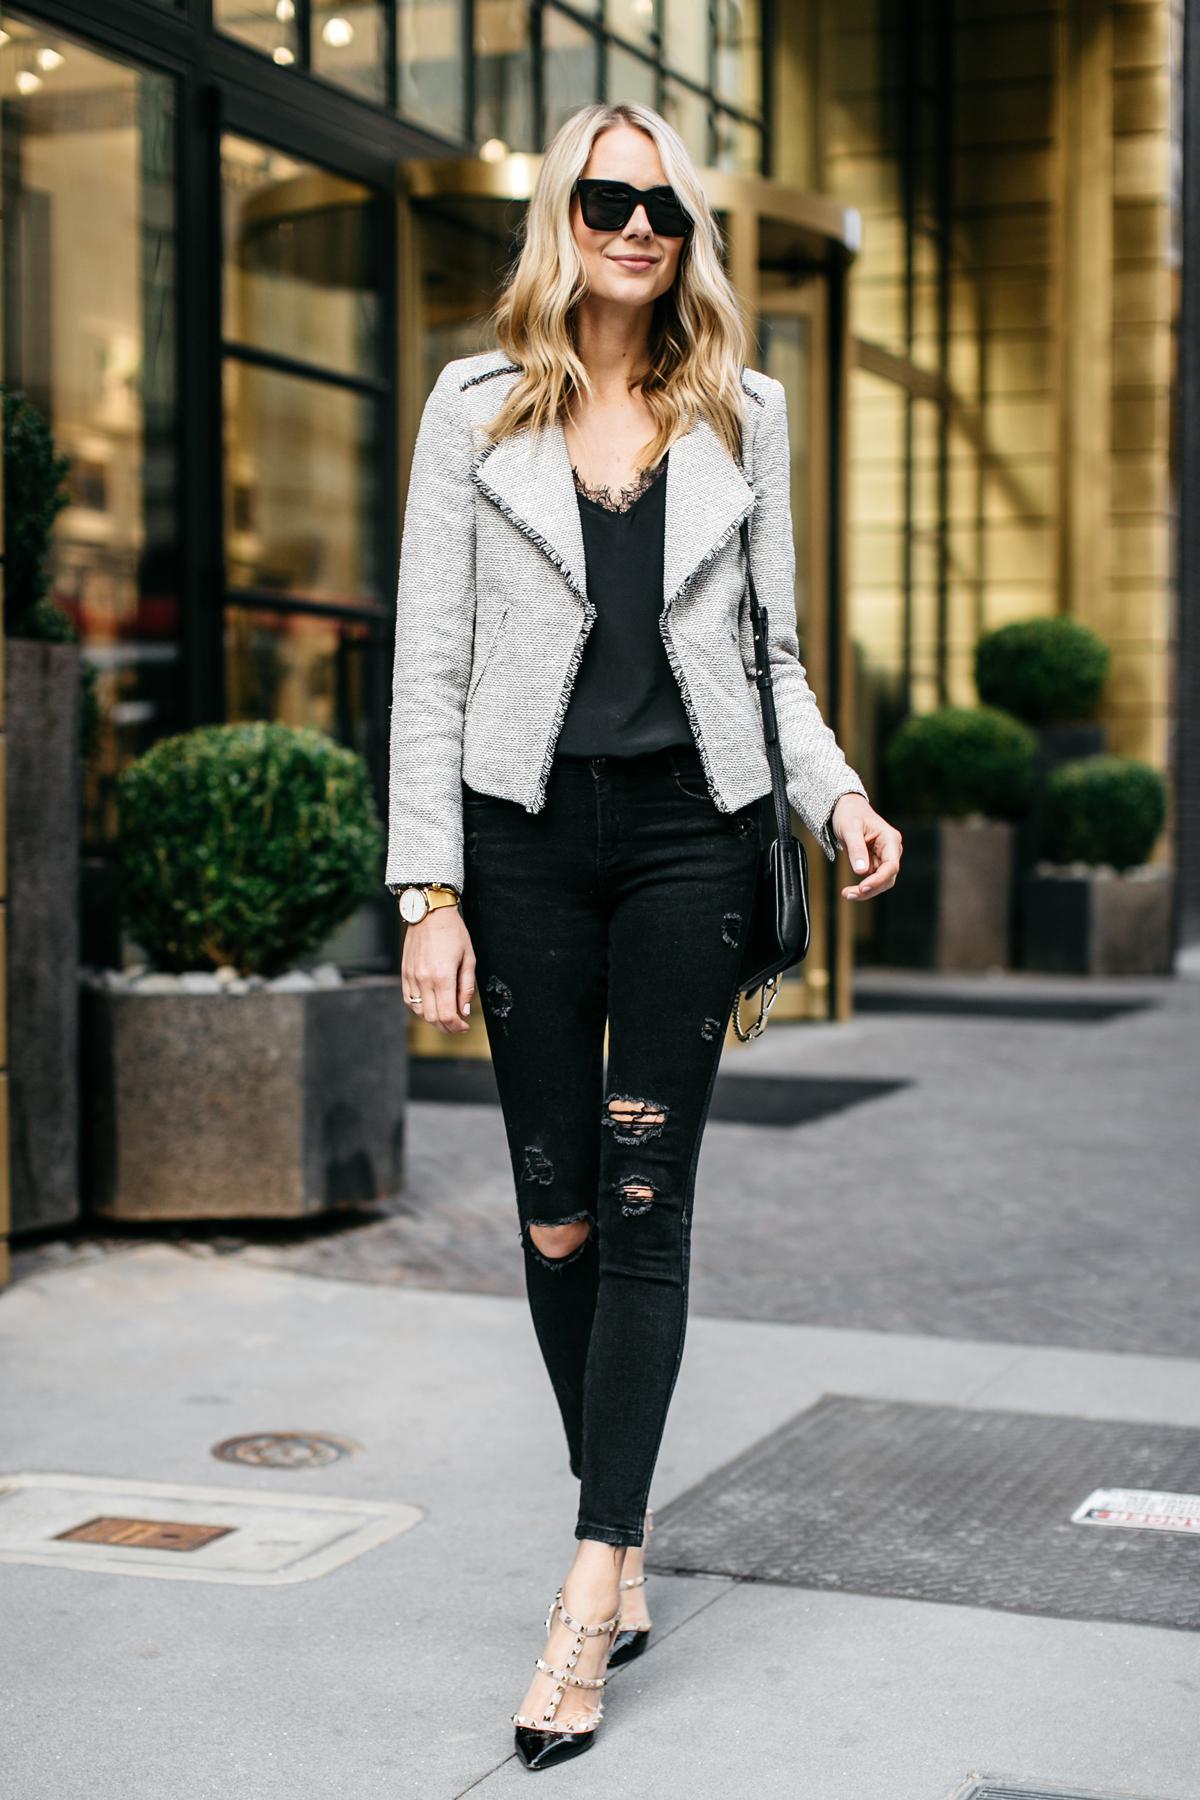 Fashion Jackson, Fringe Tweed Jacket, Black Lace Cami, Black Ripped Skinny Jeans, Valentino Rockstud Pumps